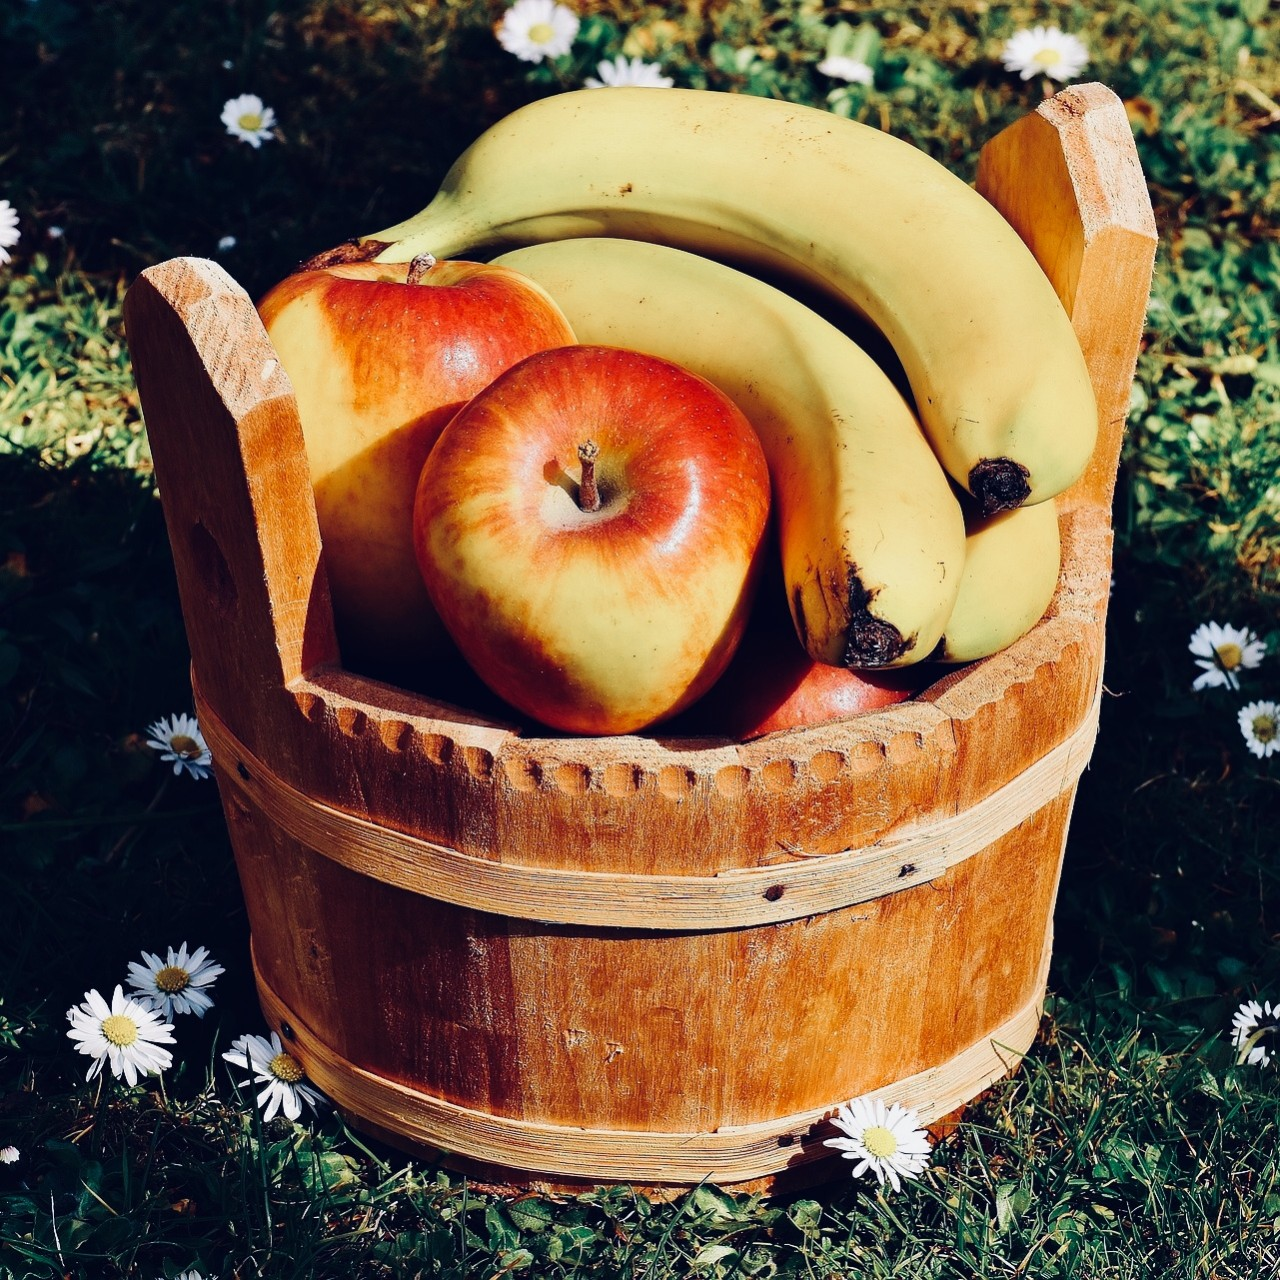 Apple or banana?..